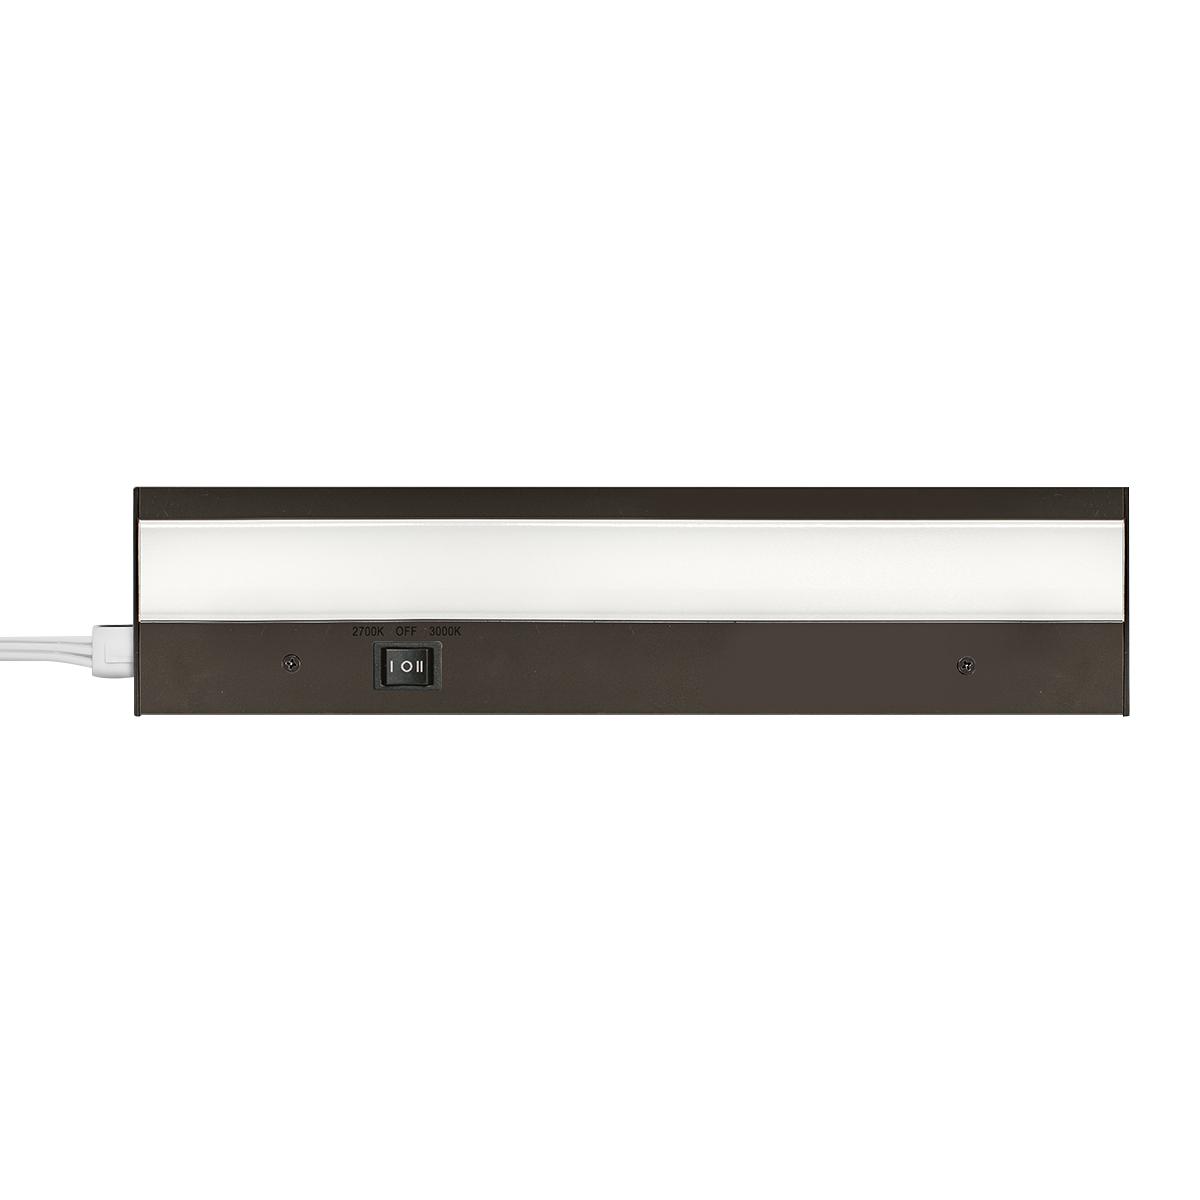 duo-ac-led-color-option-light-bars